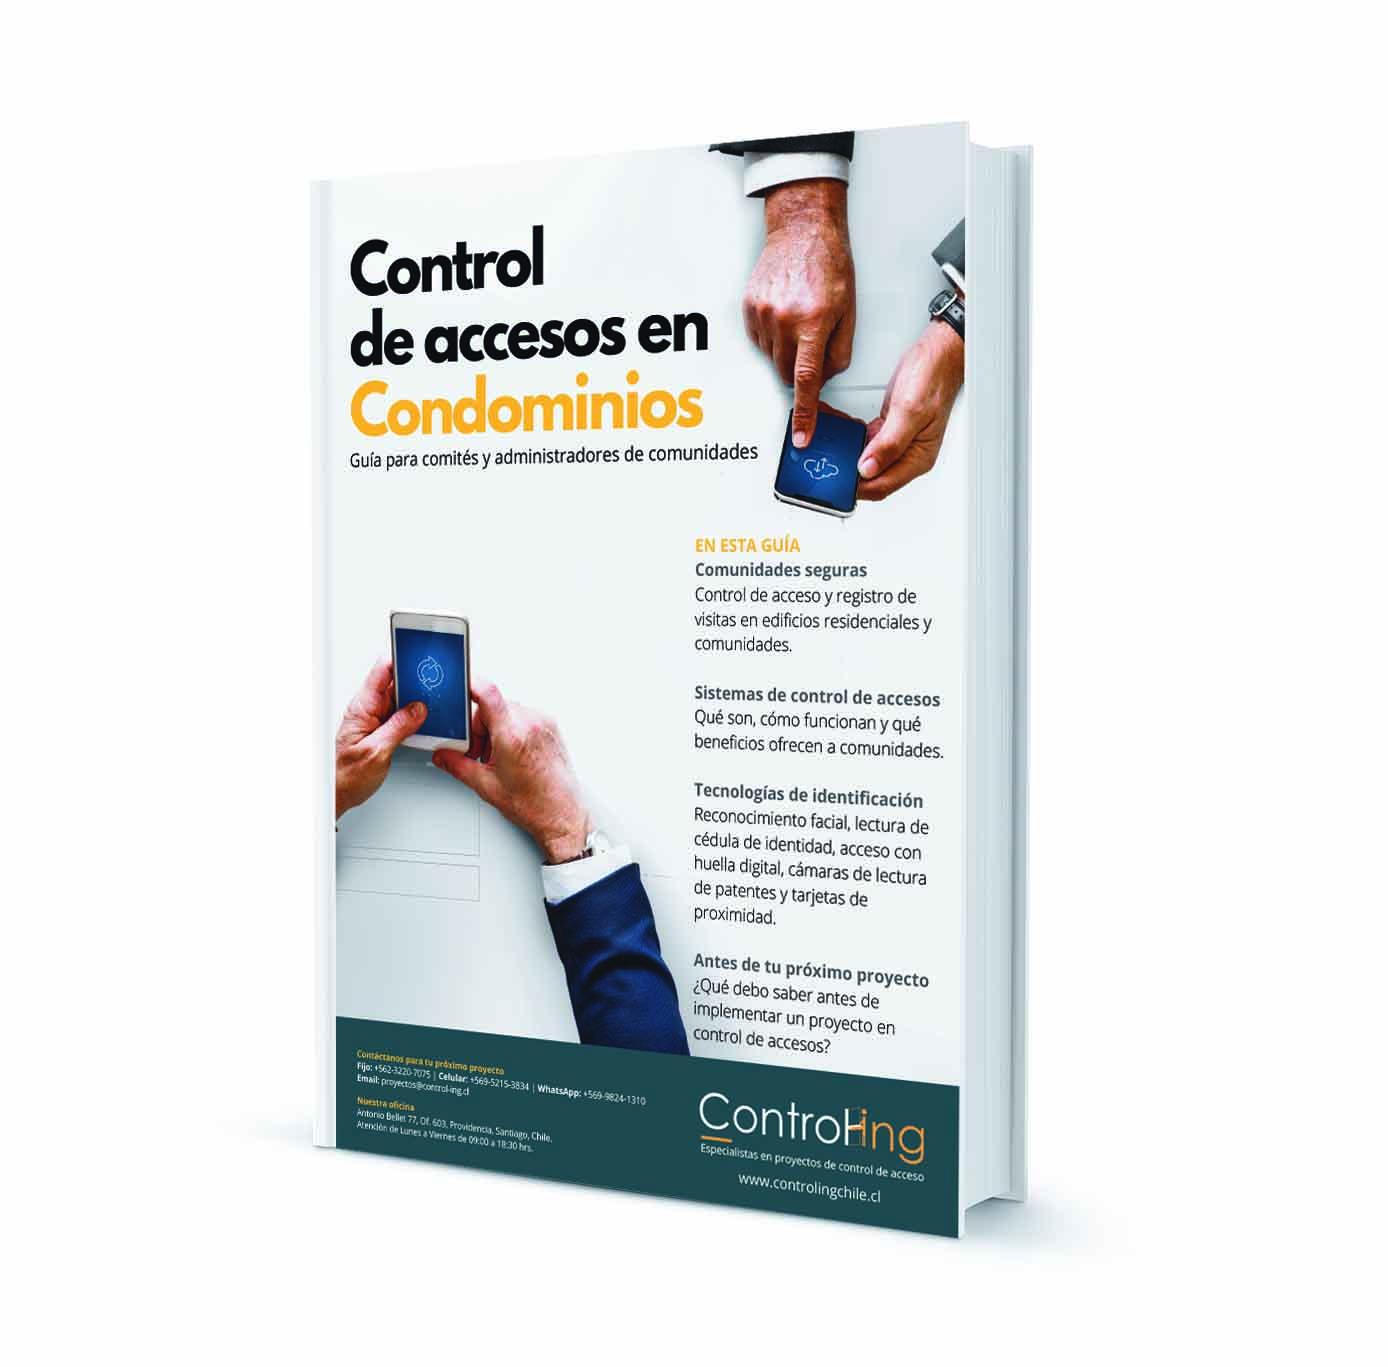 guía de descarga para condominios y comunidades